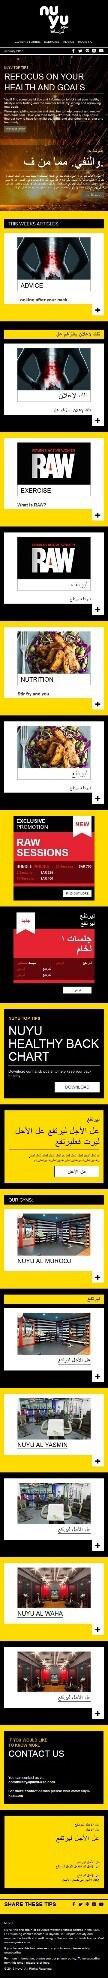 Accordion-in-Email-sample---NU-Yu